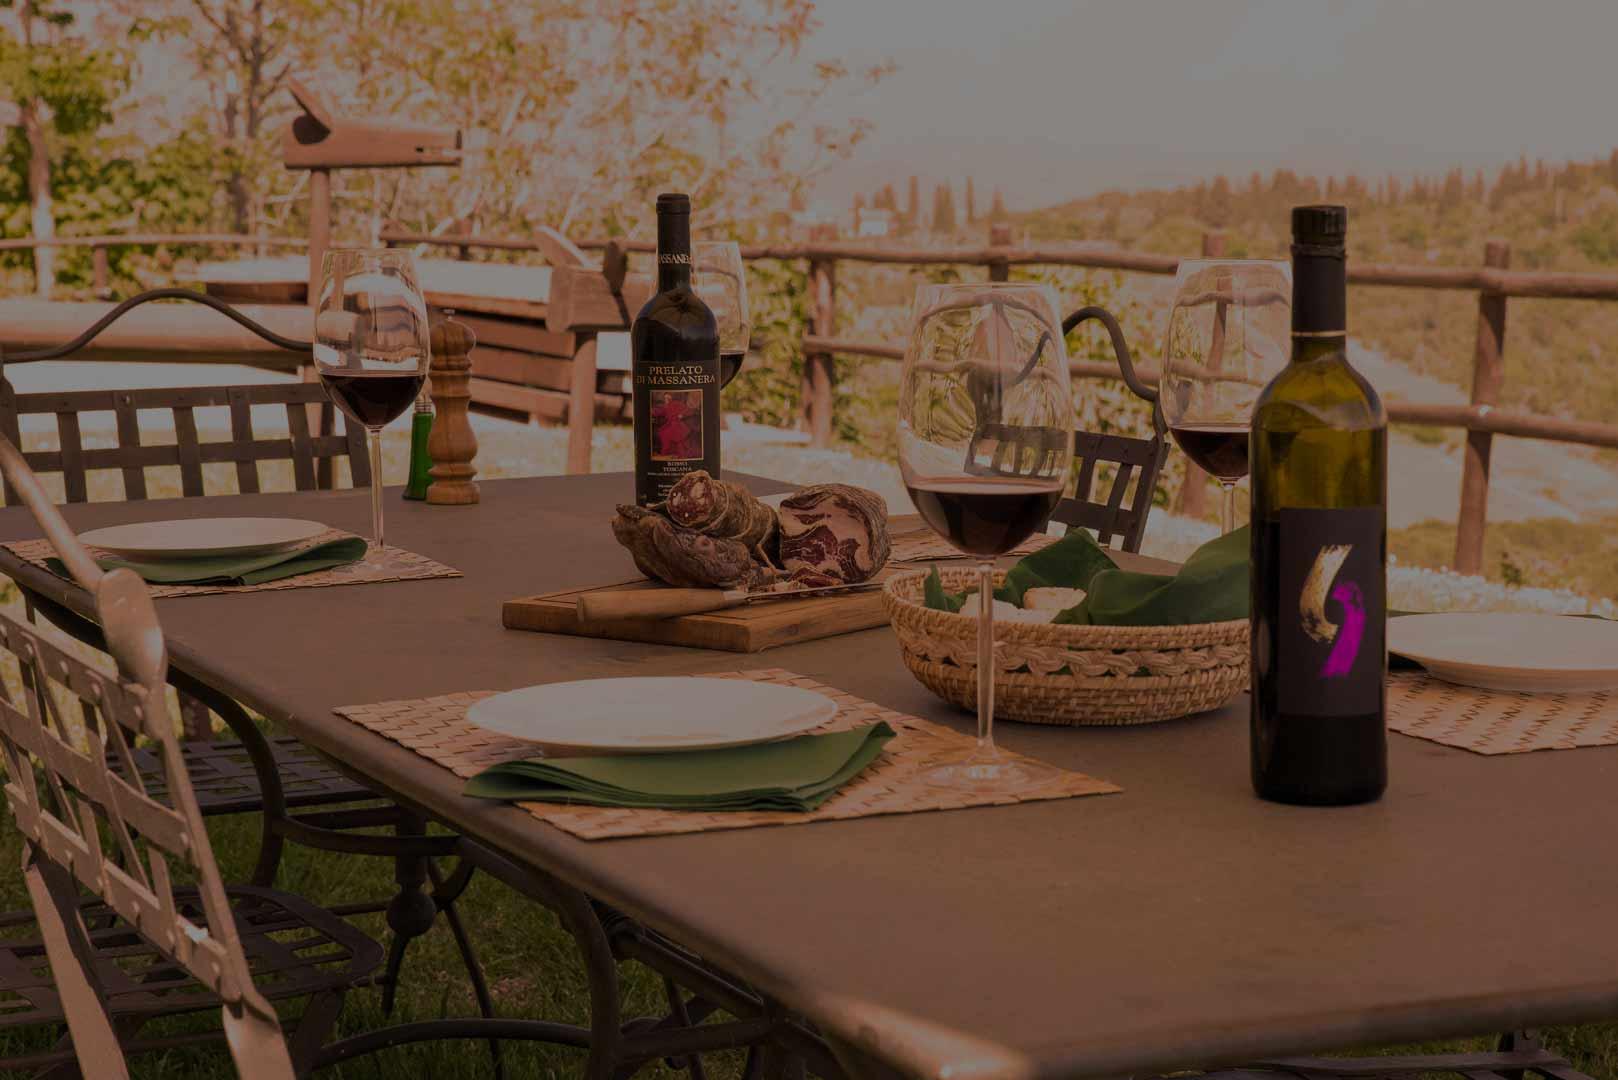 Enjoy an amazing Tuscan meal